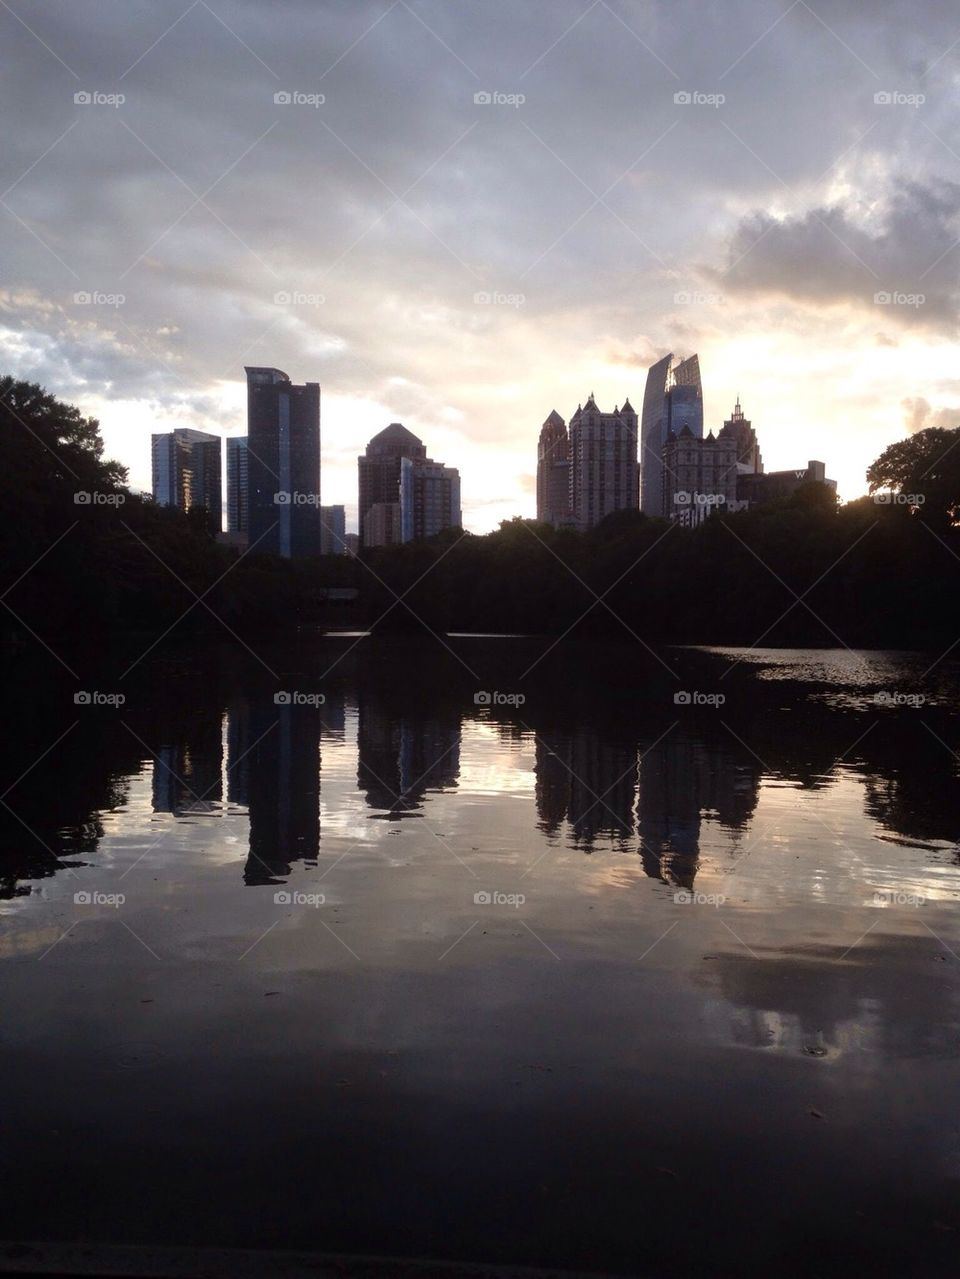 Peaceful lake at Piedmont Park in Midtown Atlanta